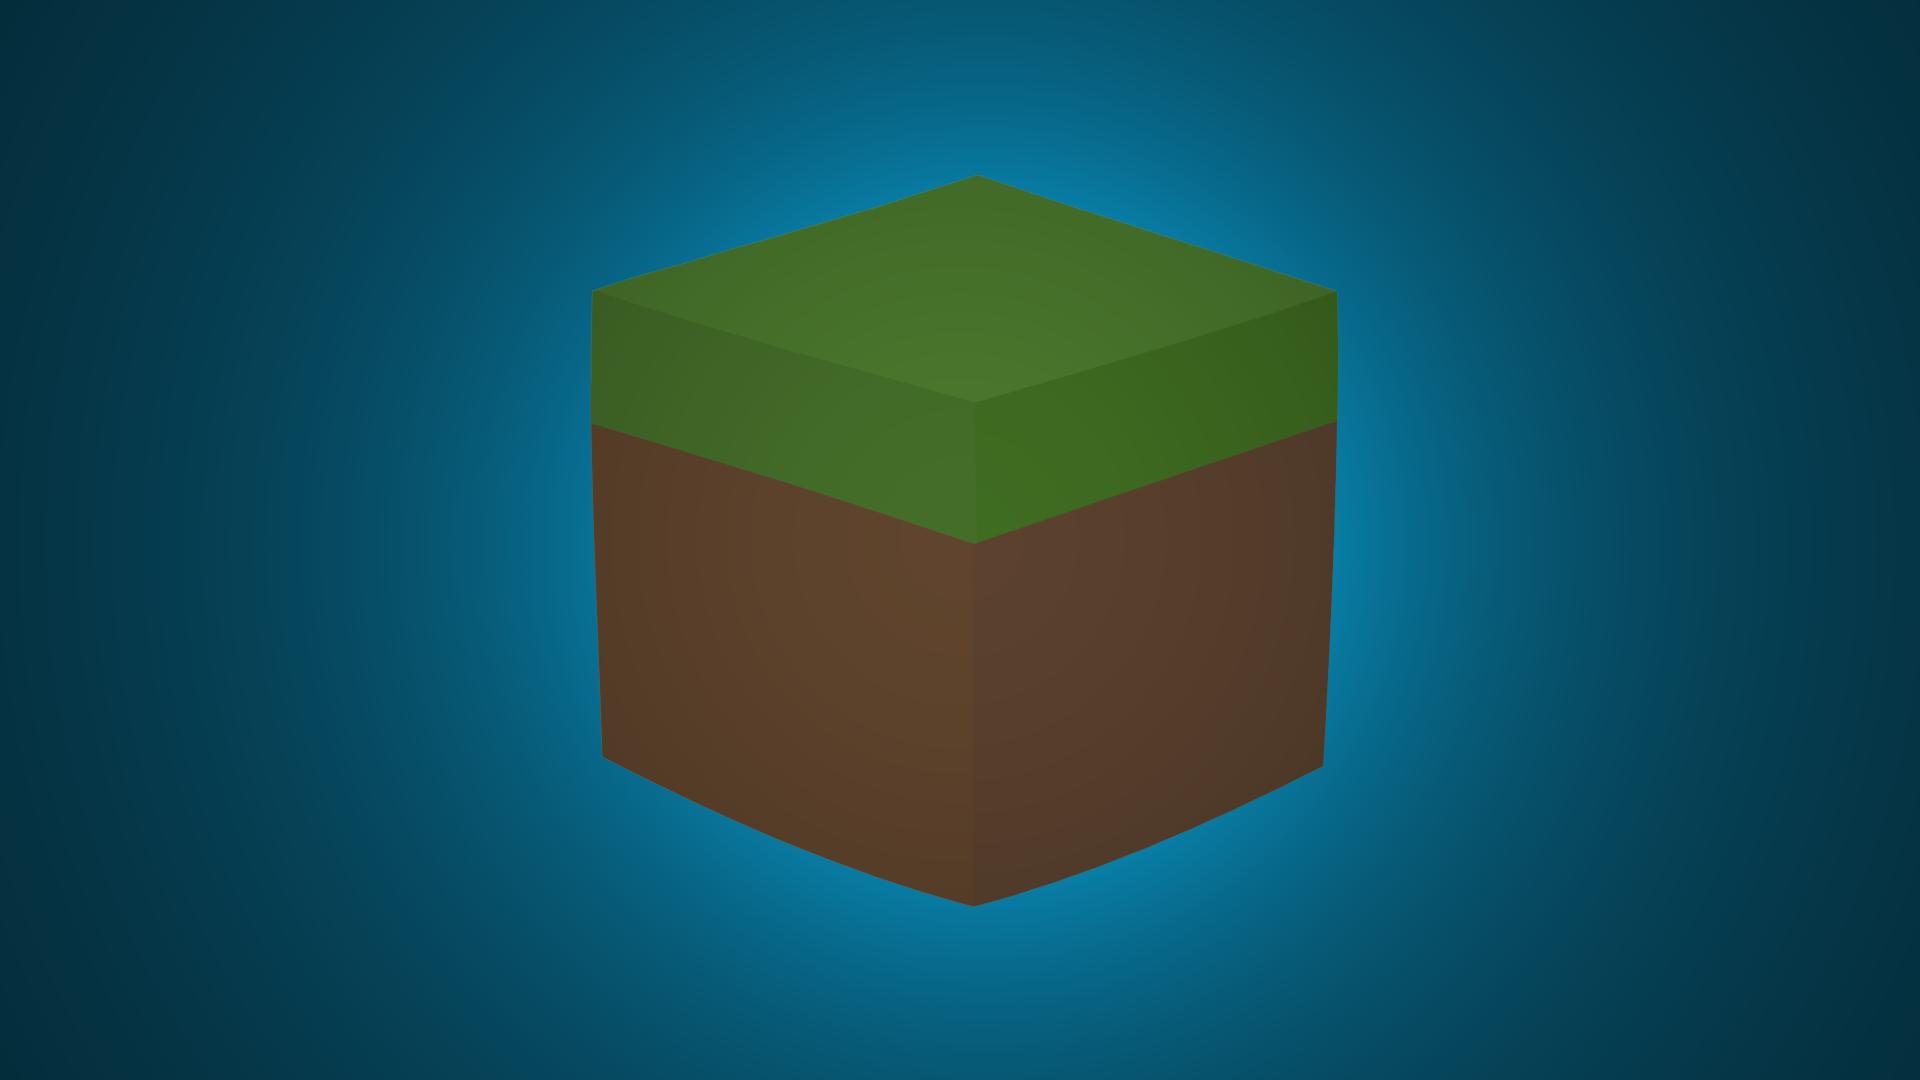 Minecraft Minimalist Grass Block Wallpaper by DarkGS 1920x1080